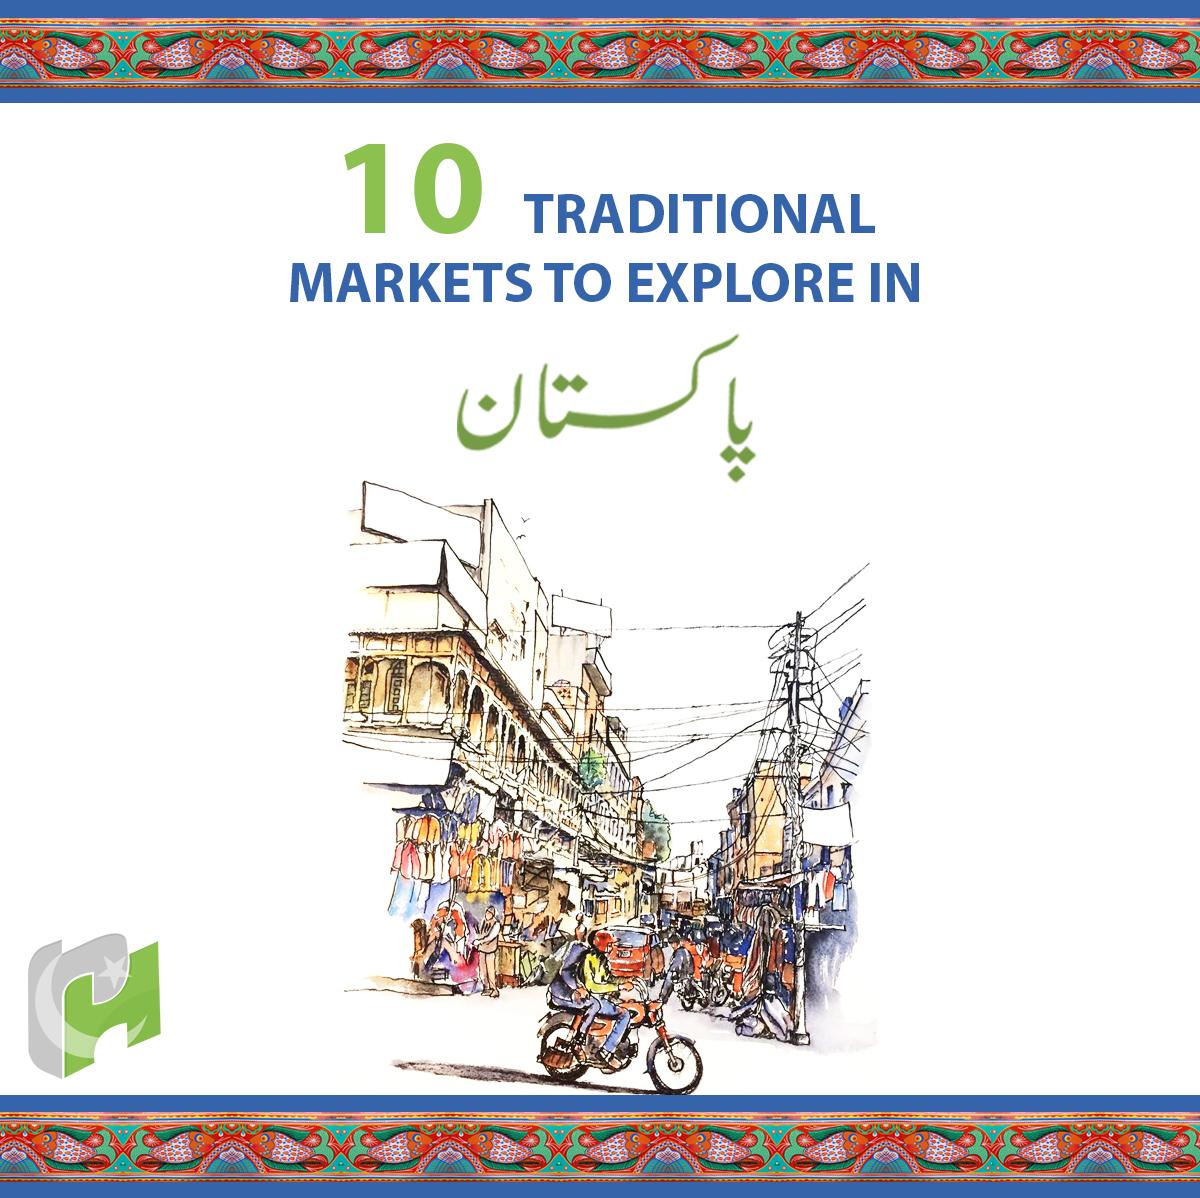 Traditional marketplaces Pakistan, bazar, traditional markets of Pakistan